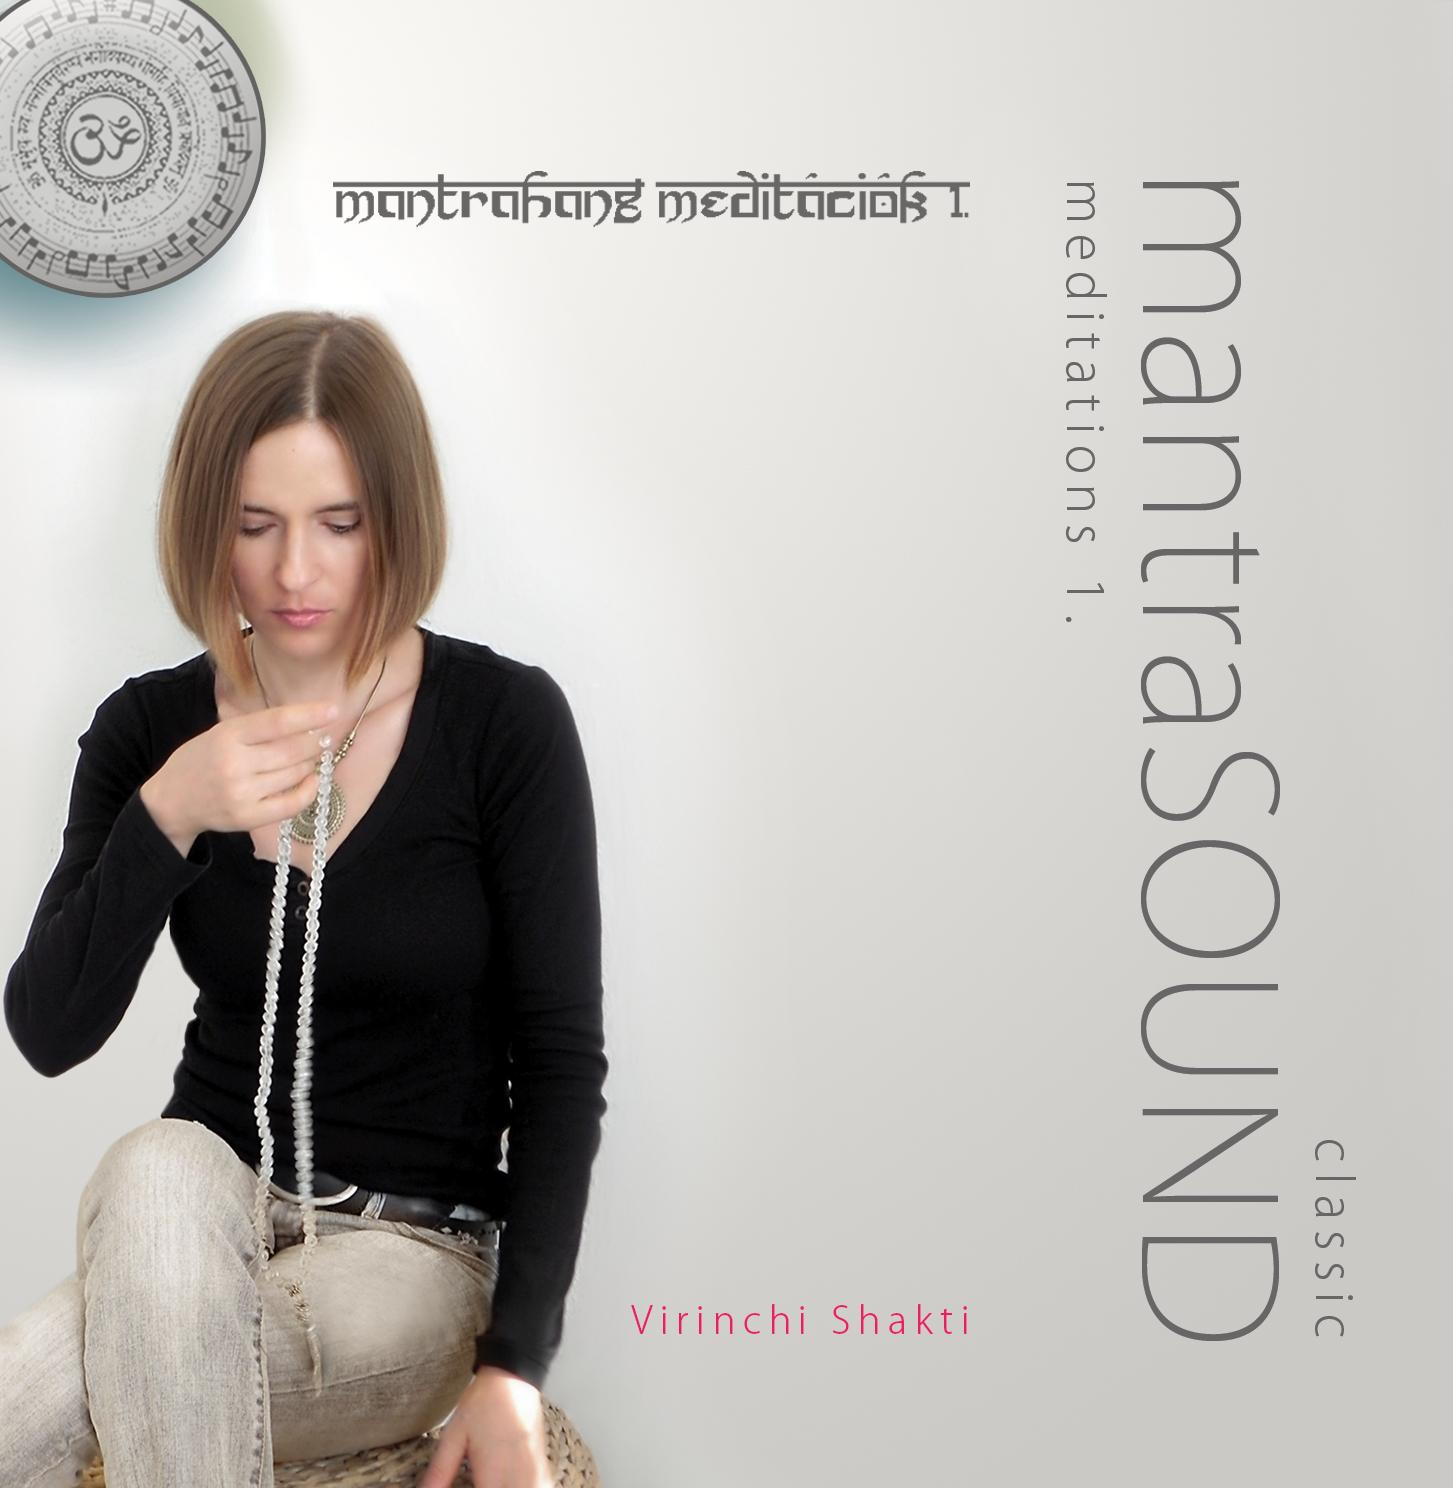 SHAKTI, VIRINCHI - MANTRASOUND MEDITATIONS 1. - CD -